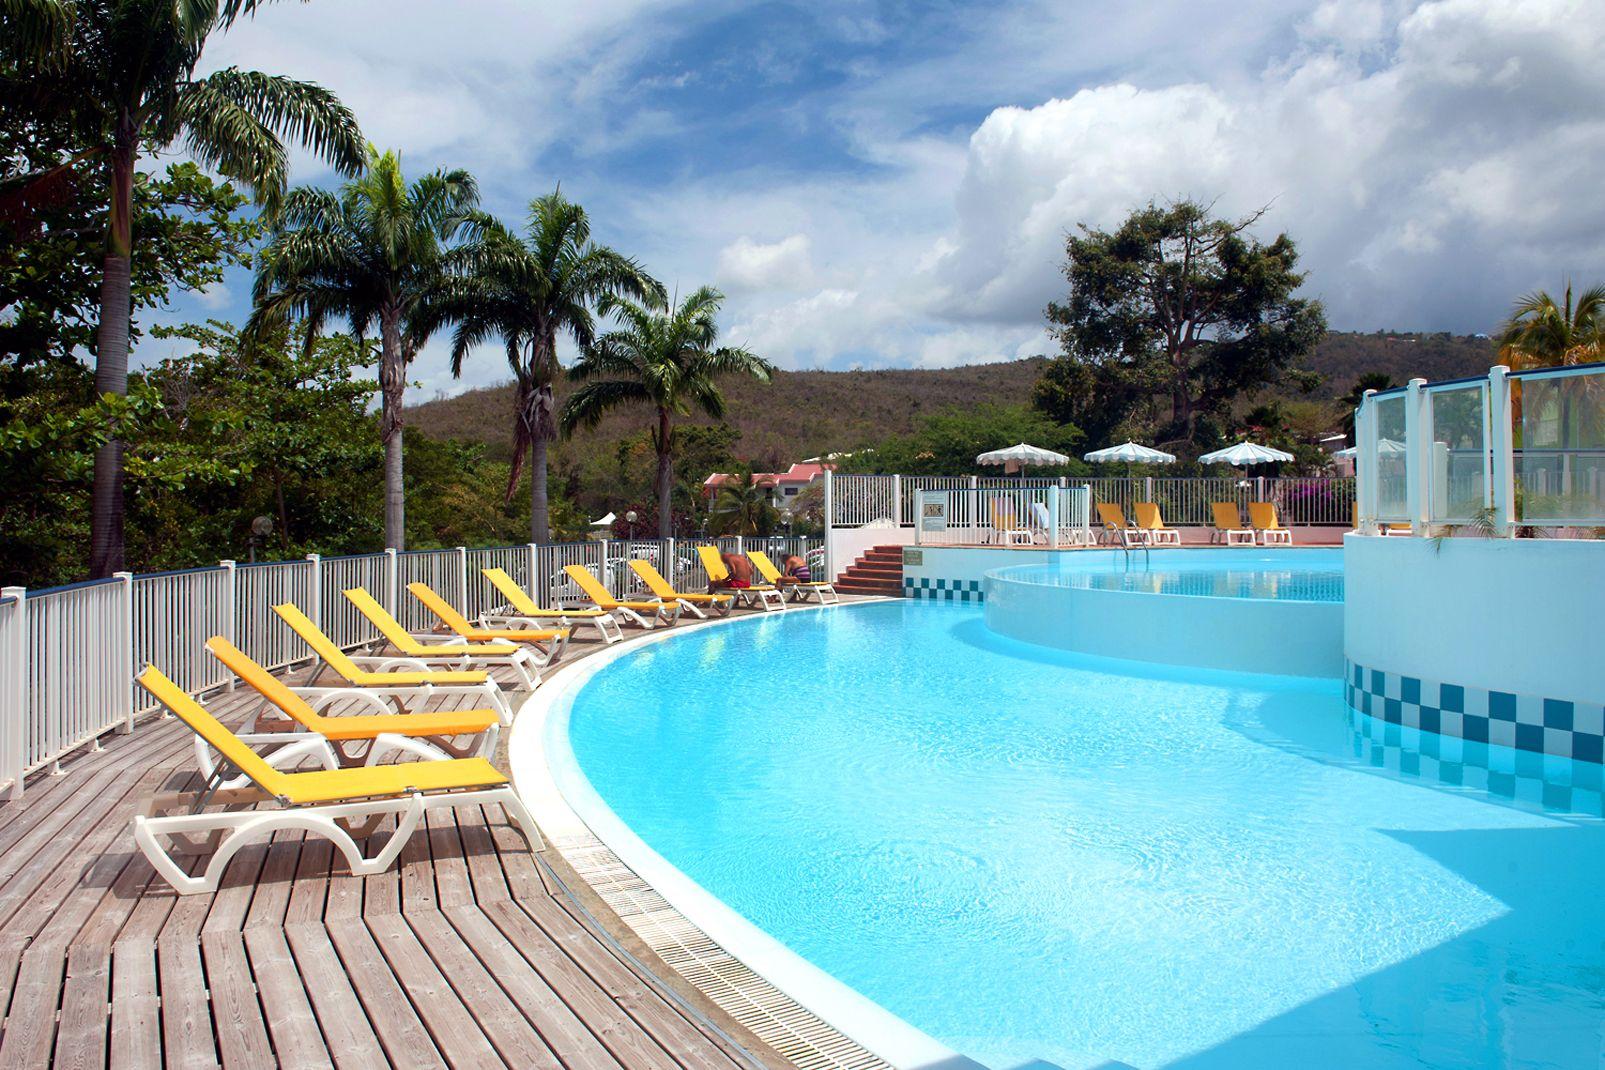 Hôtel Karibéa Amandiers 3* - 1